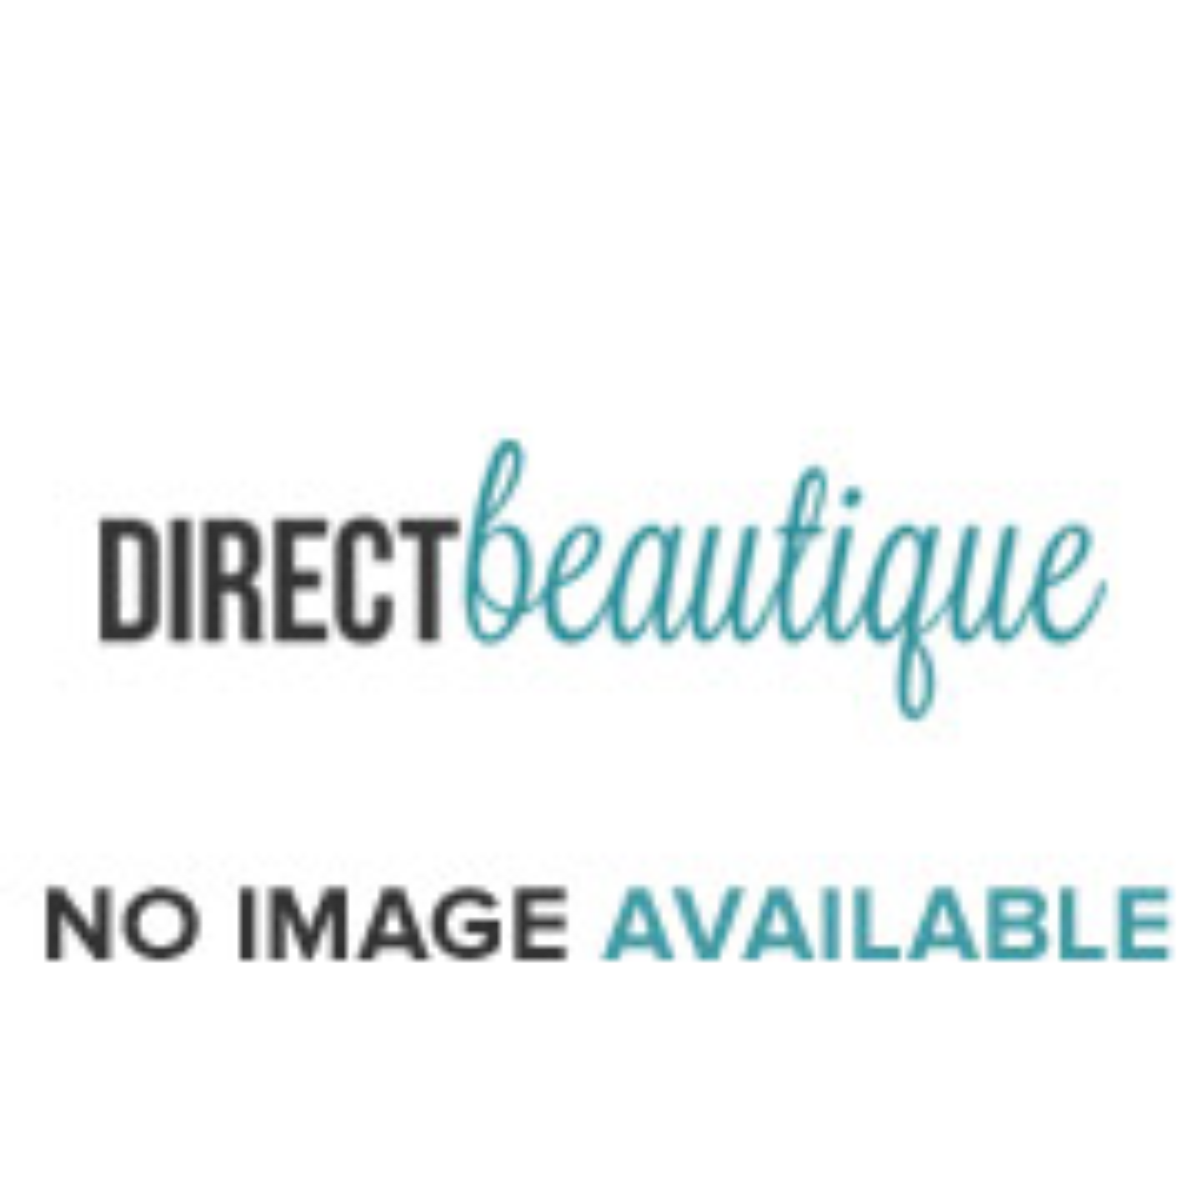 Sisley Botanical Eye and Lip Contour Balm 30ml